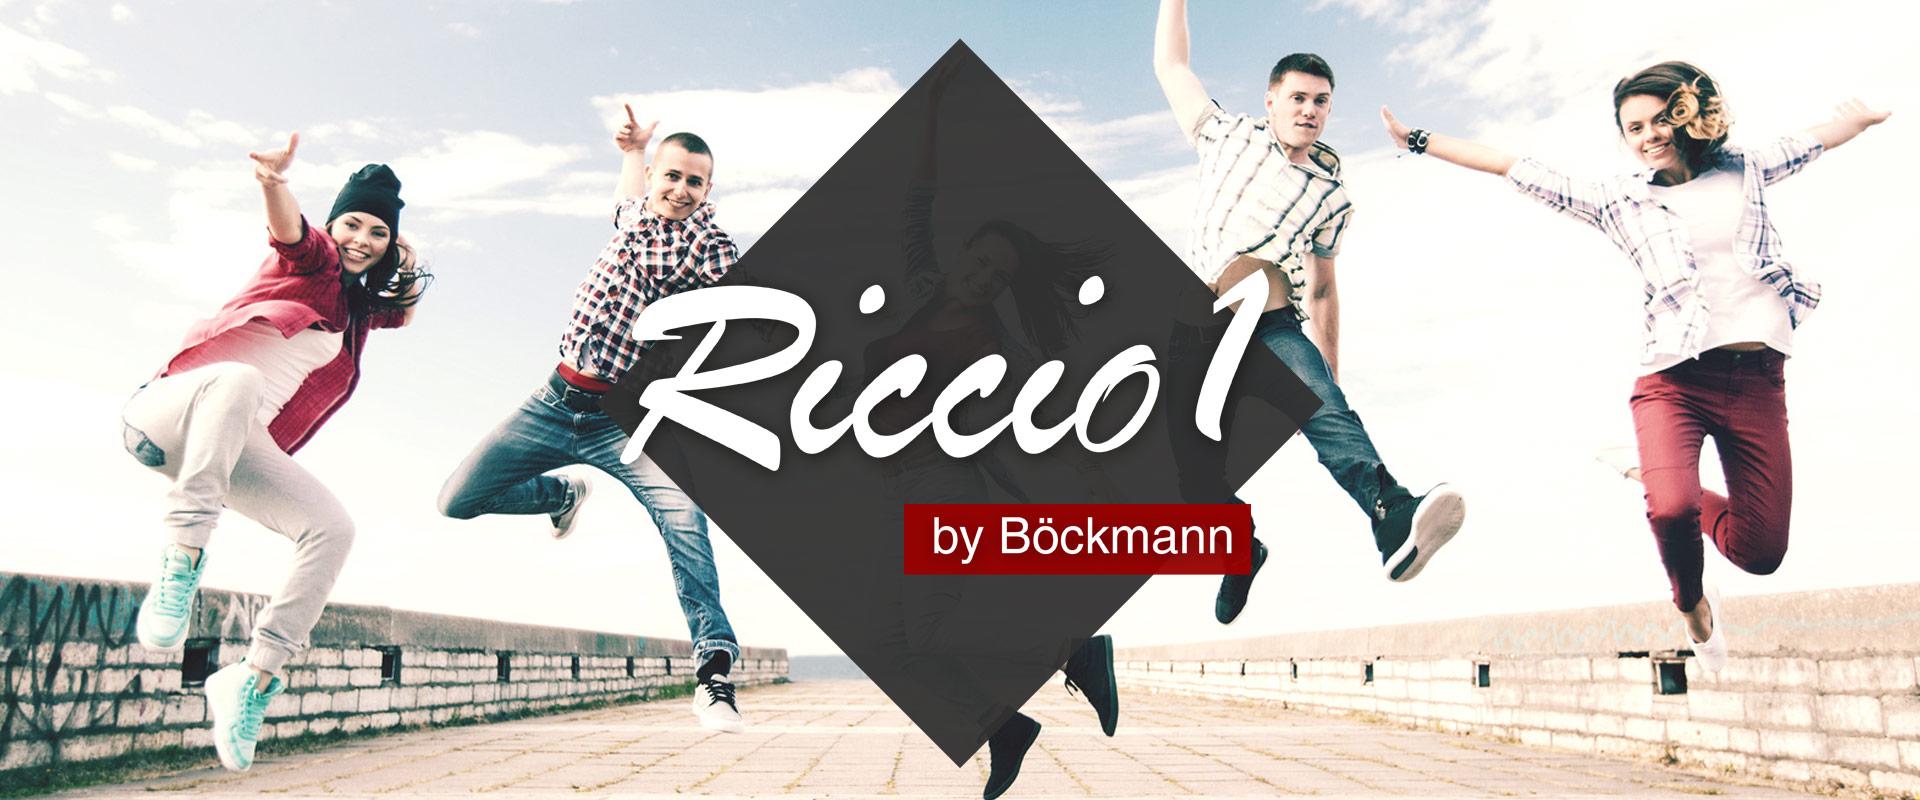 Riccio 1 by Böckmann